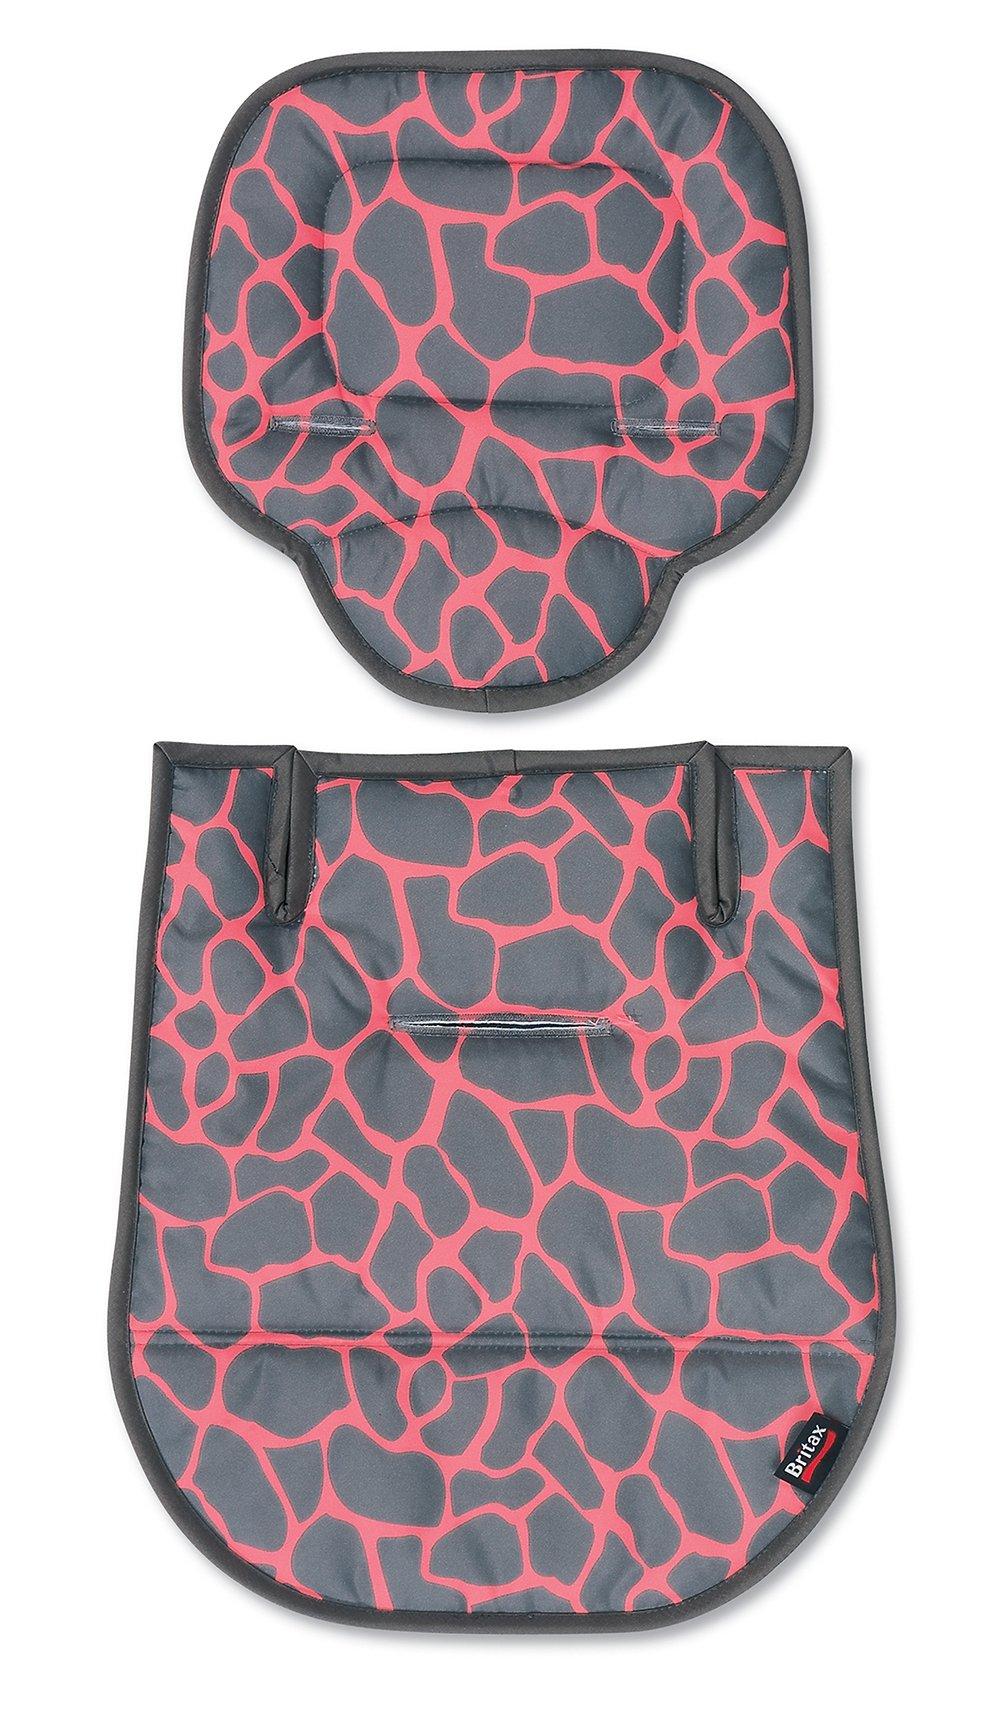 Britax B-Agile Fashion Stroller Kit, Pink Giraffe by Britax USA (Image #1)